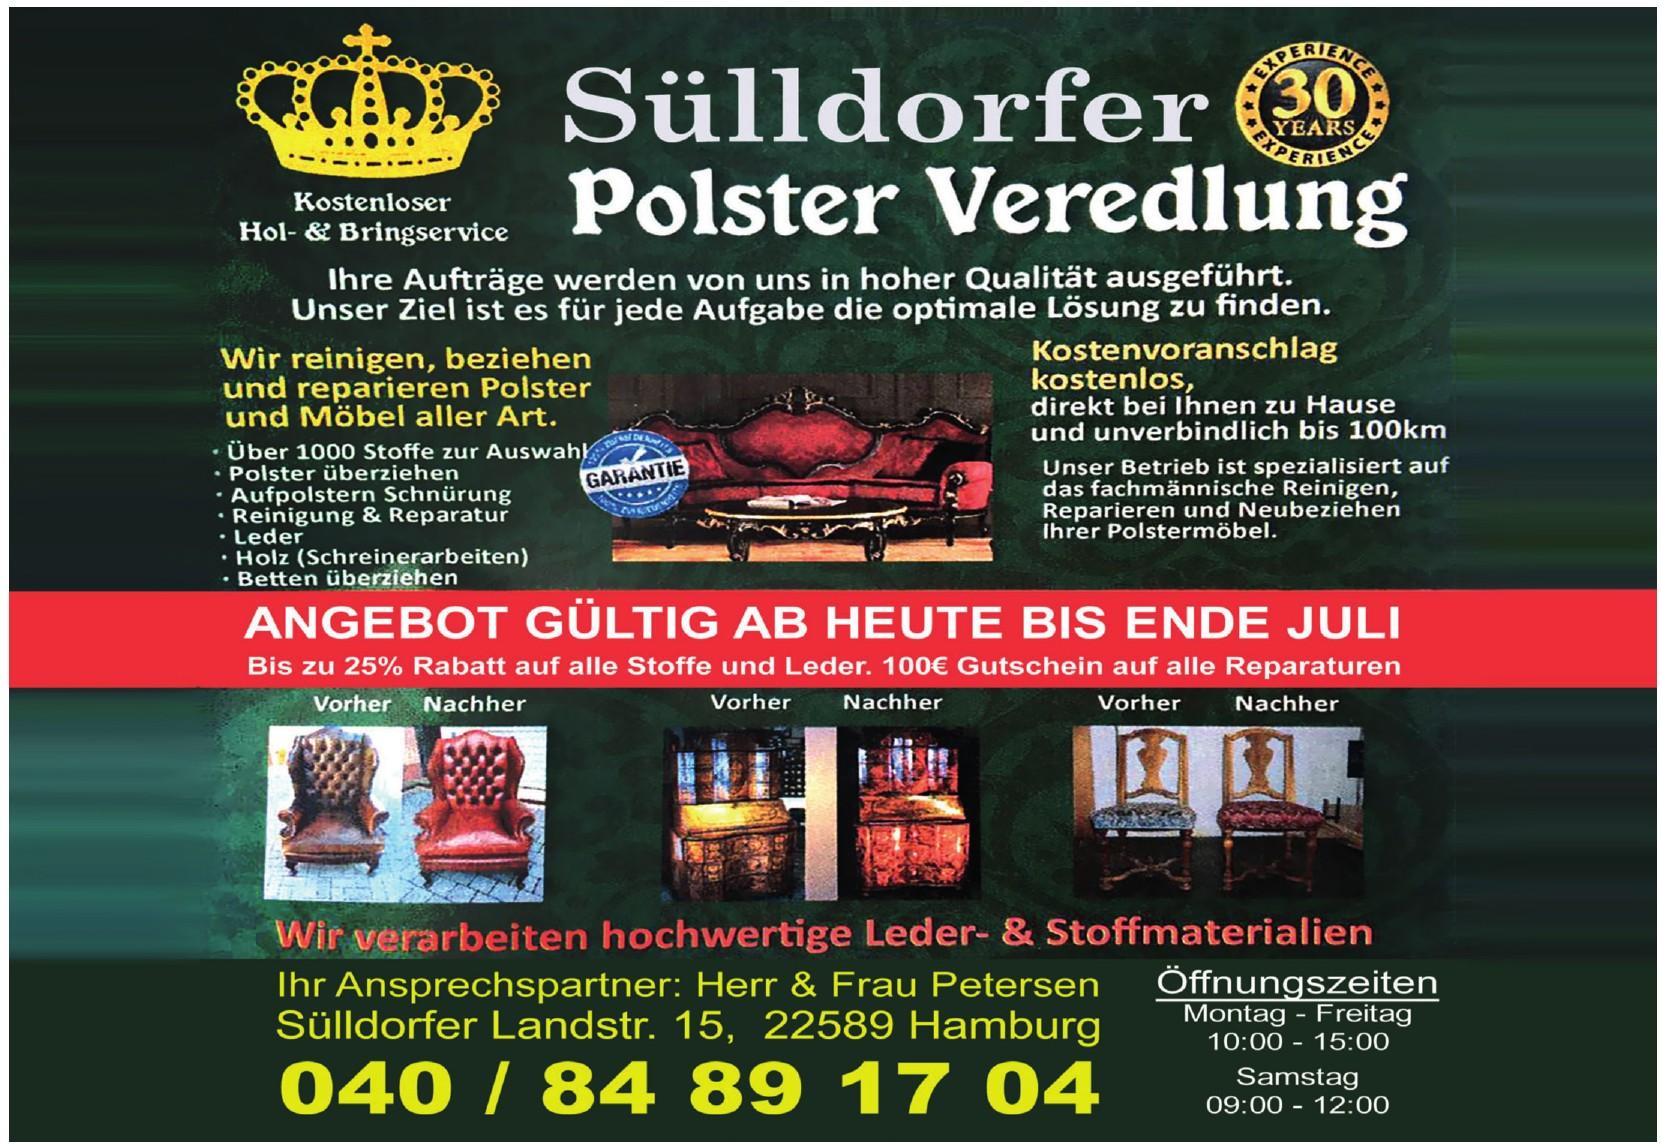 Sülldorfer Polster Veredelung